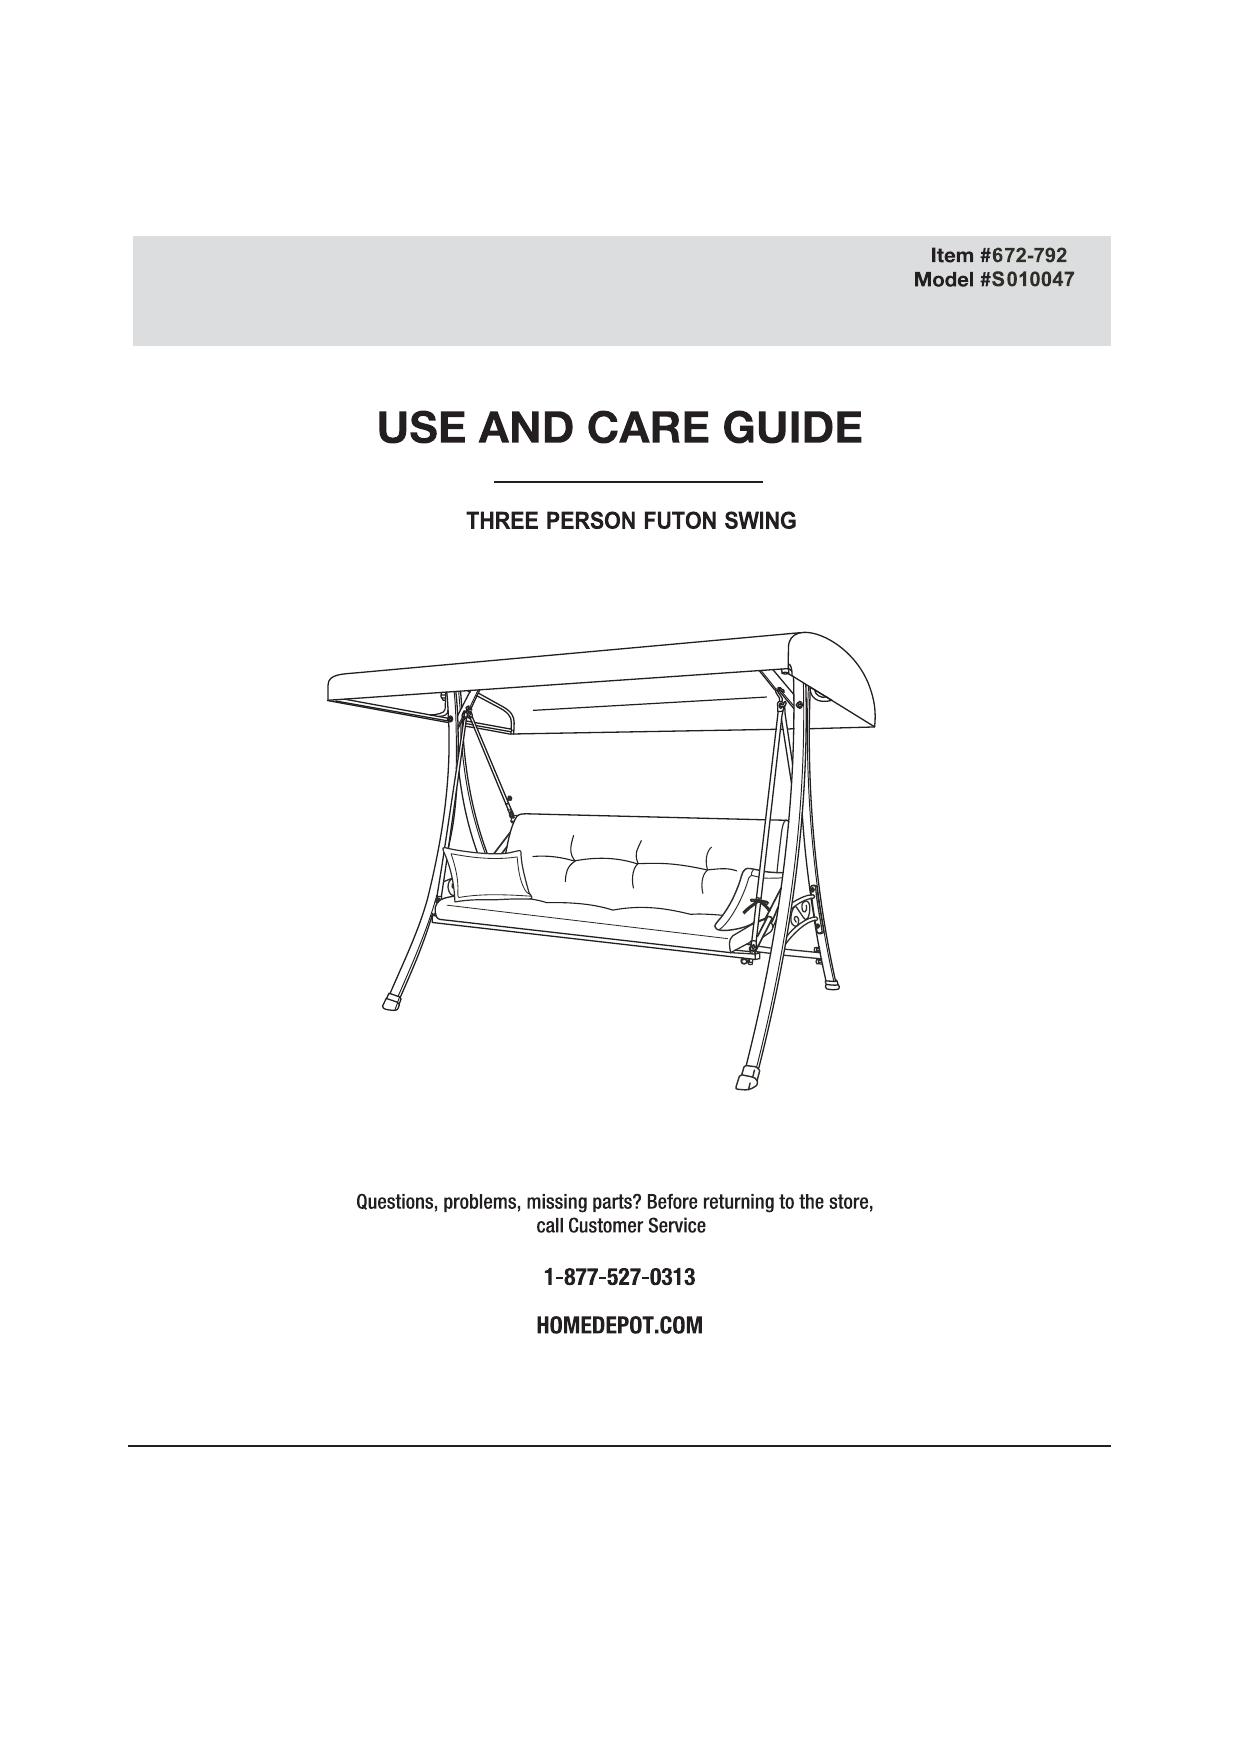 hampton bay s010047 installation guide